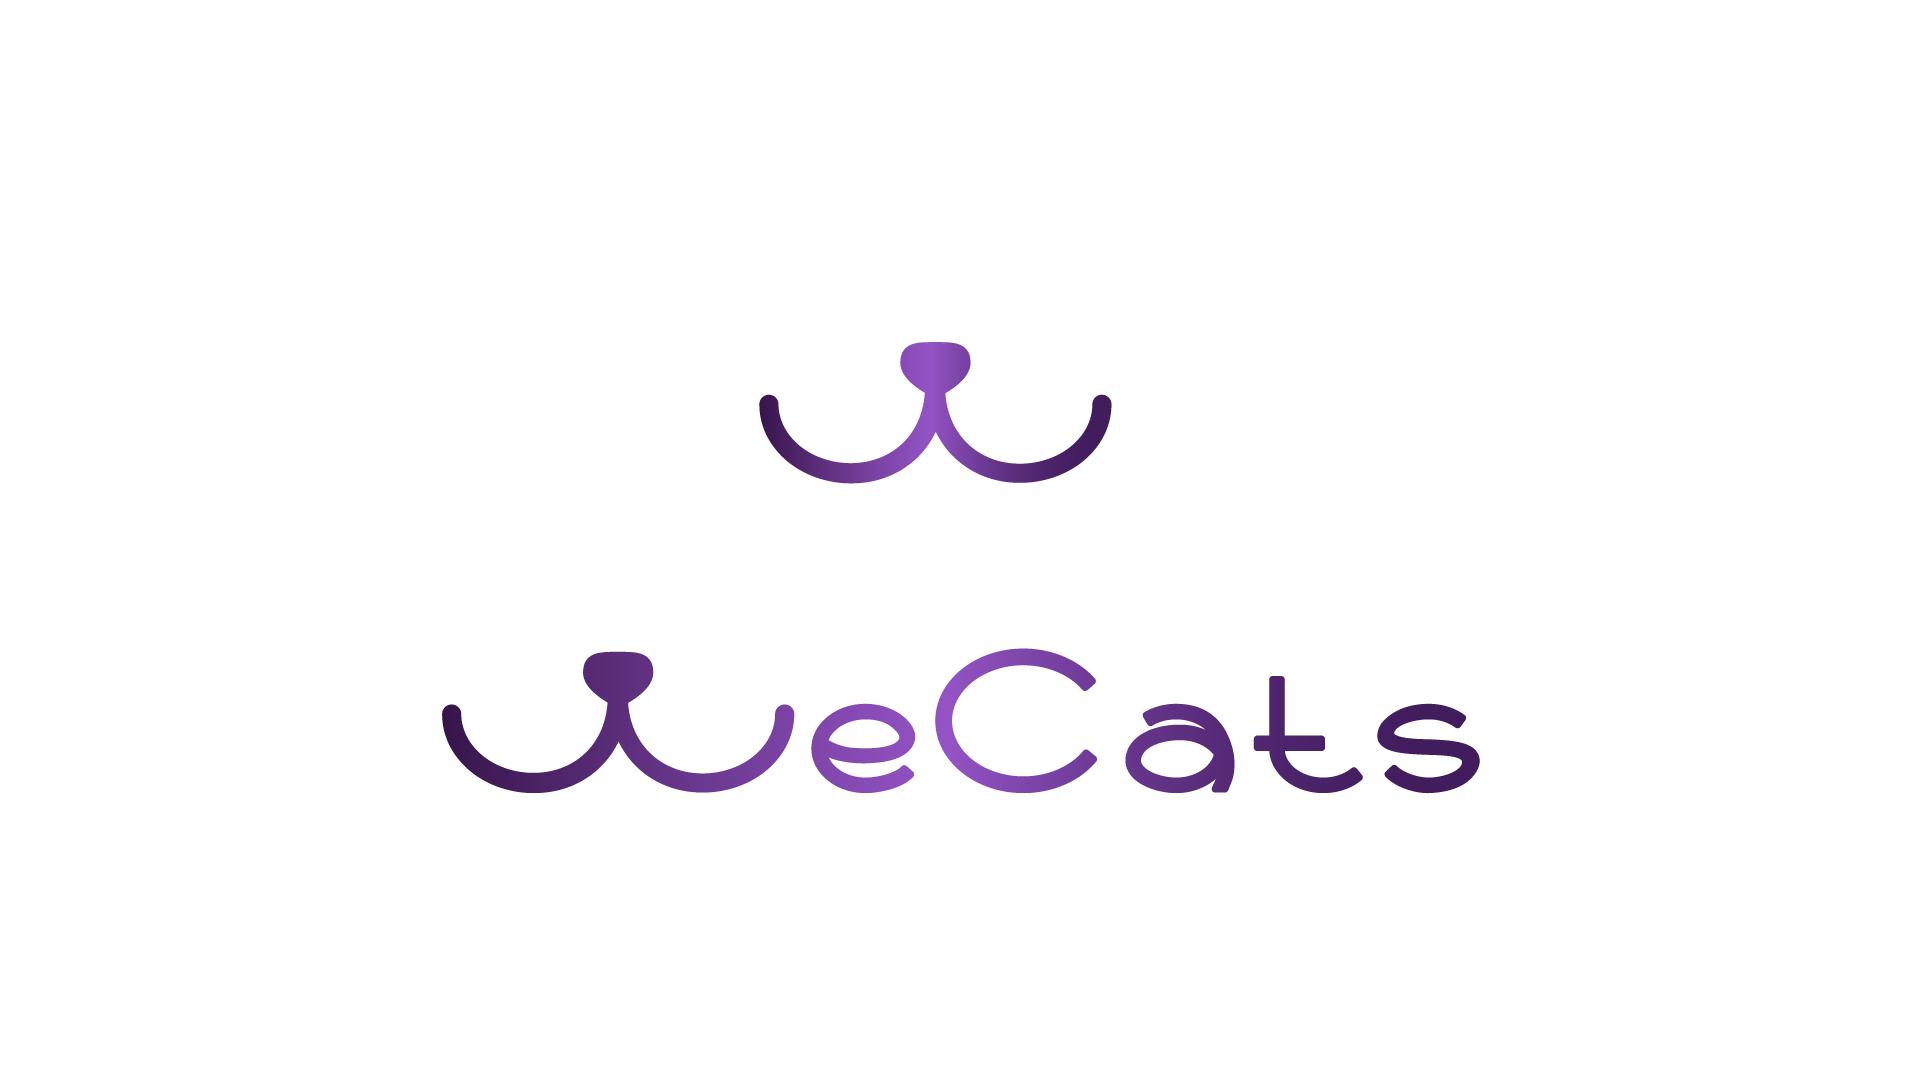 Создание логотипа WeCats фото f_2115f192b3f2b1dd.png